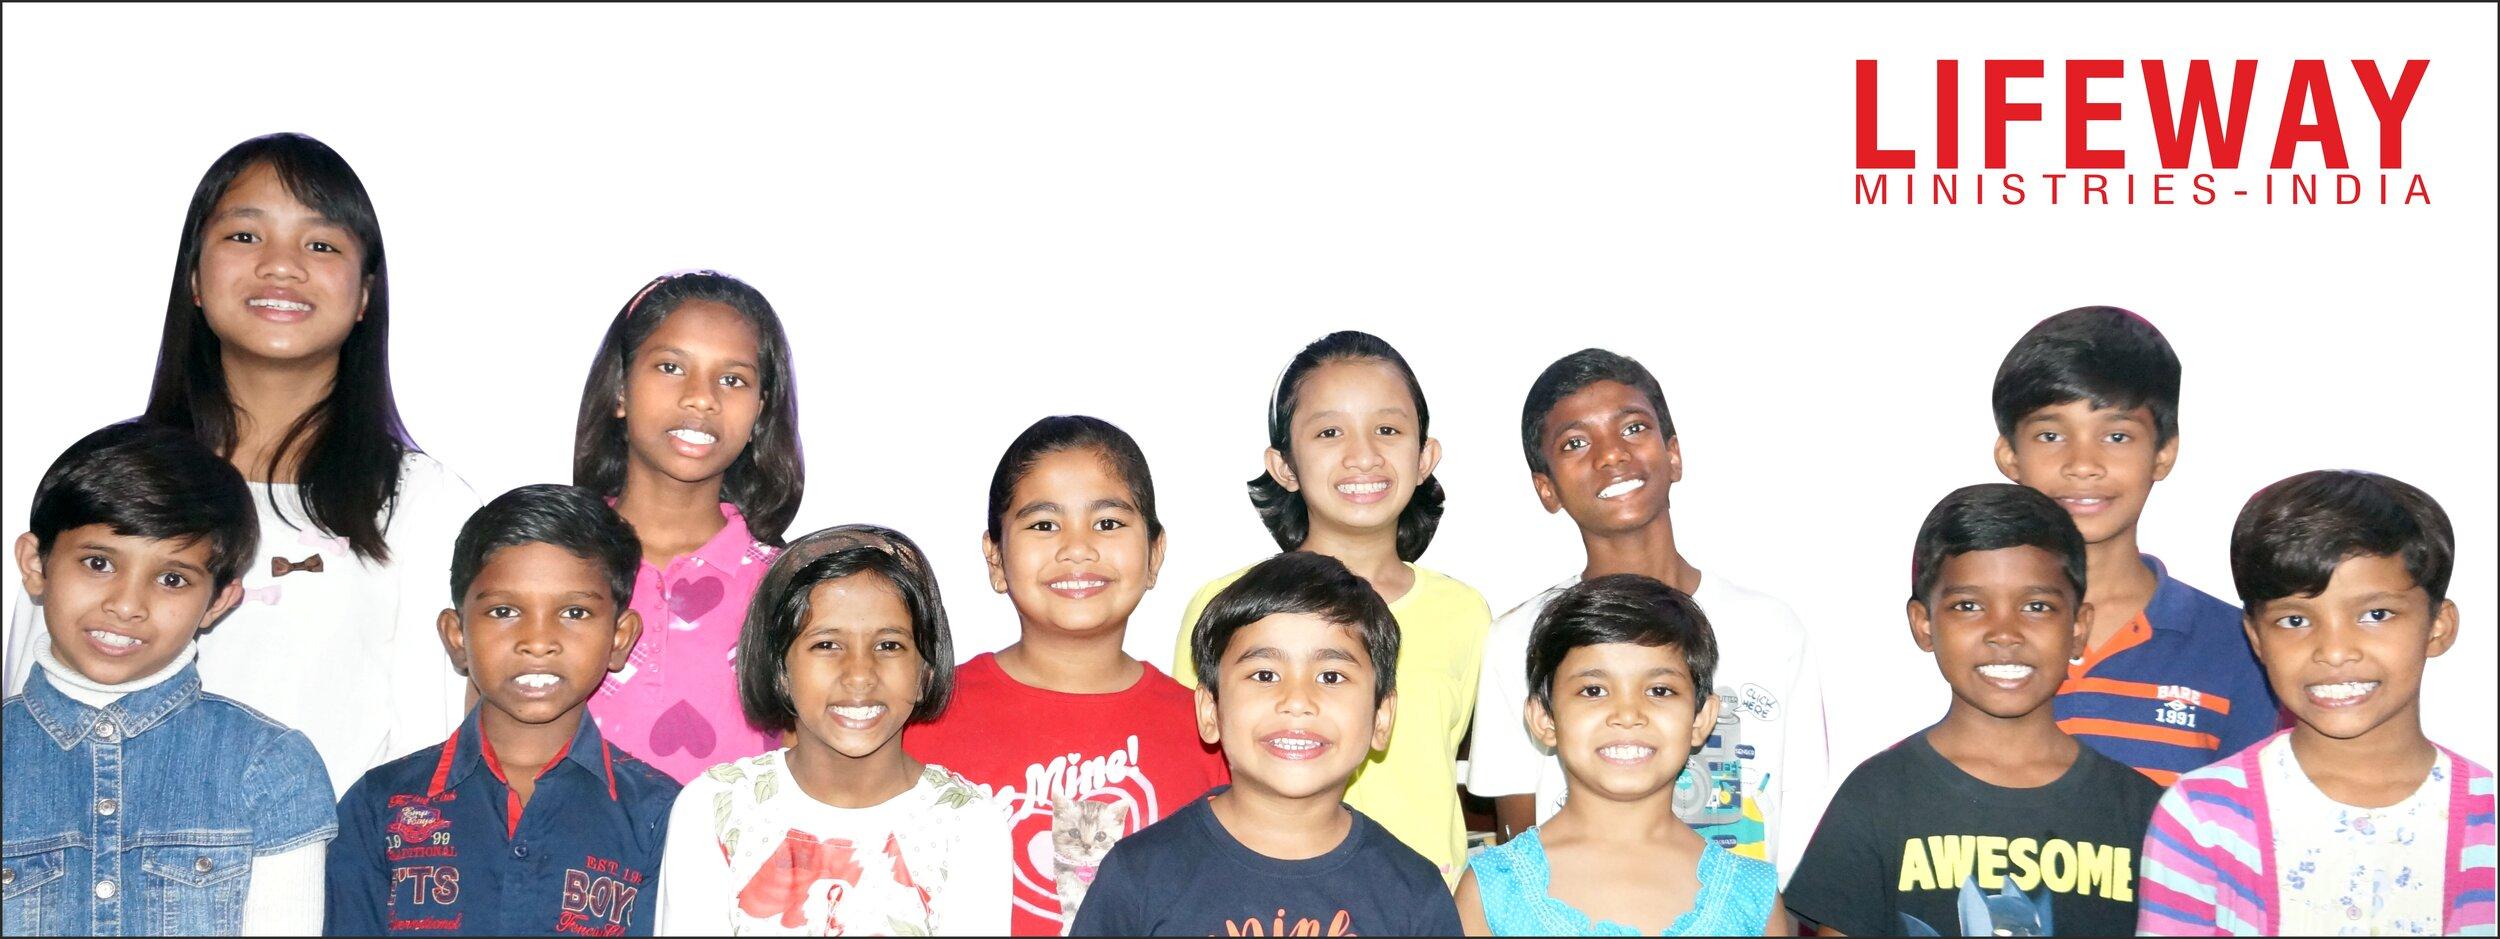 Lifeway Children Cover Photo.jpg